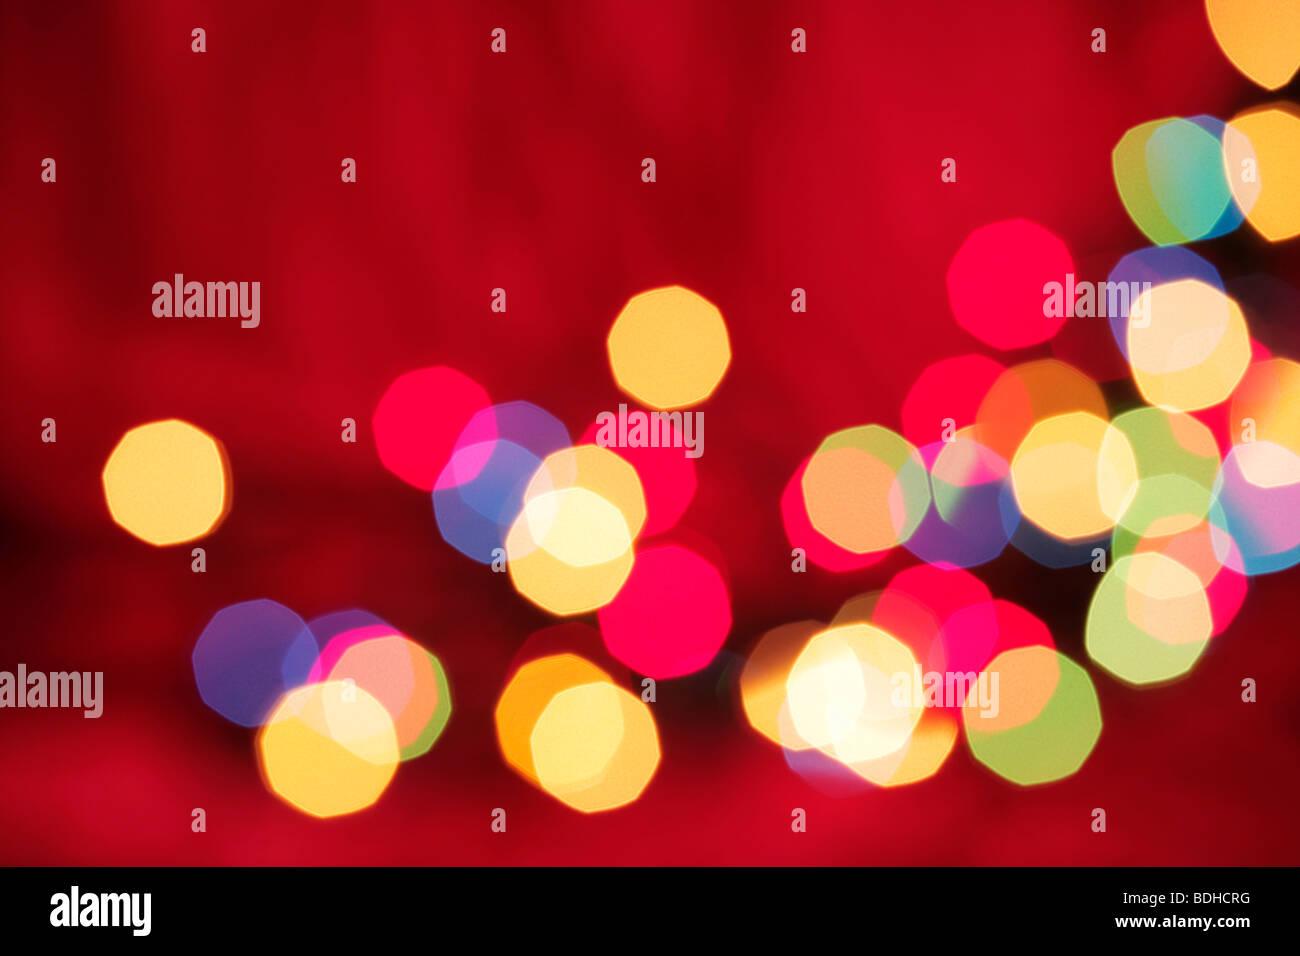 Nice abstract Christmas lights background - Stock Image